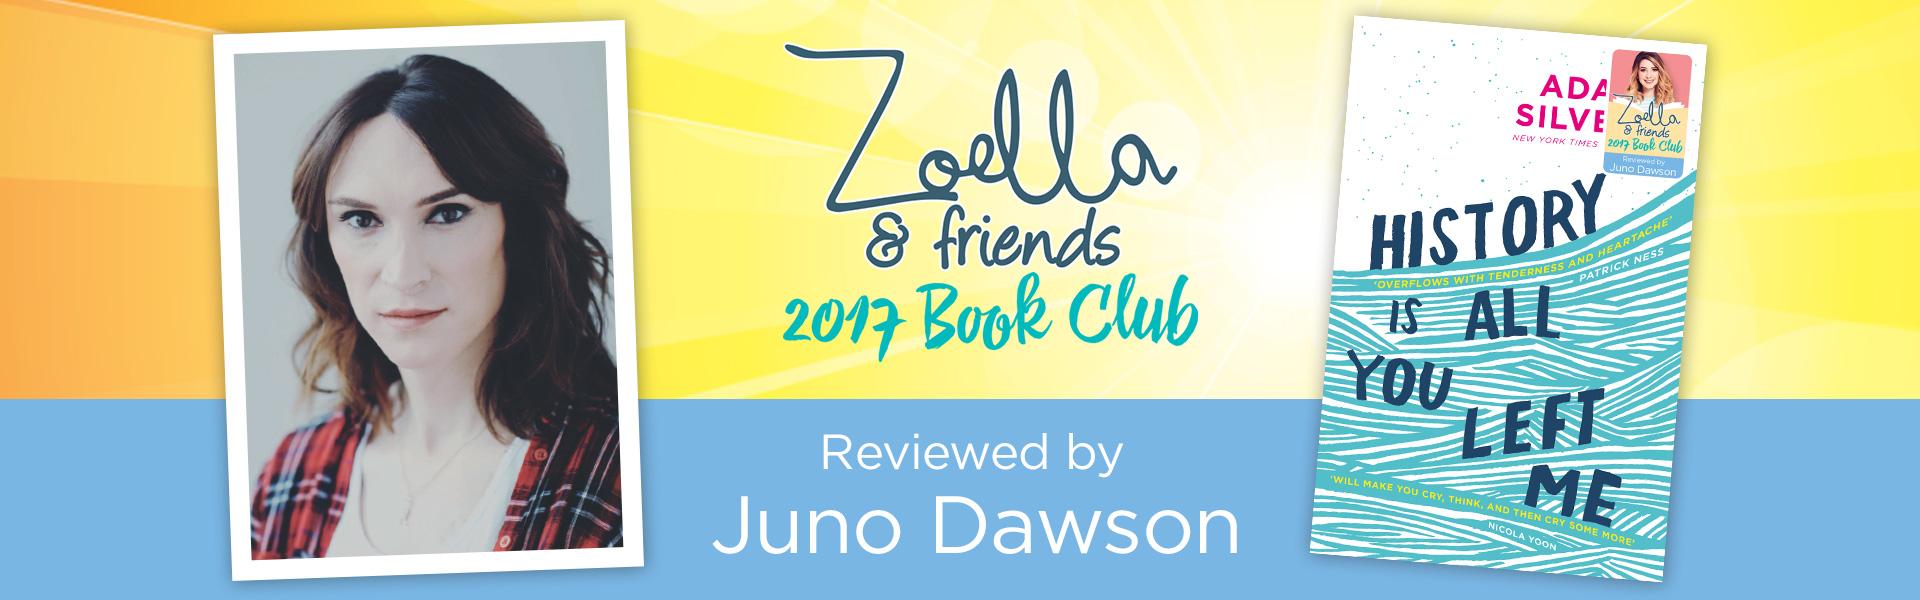 Zoella & Friends 2017 Book Club: Juno Dawson Reviews History is All You Left Me by Adam Silvera